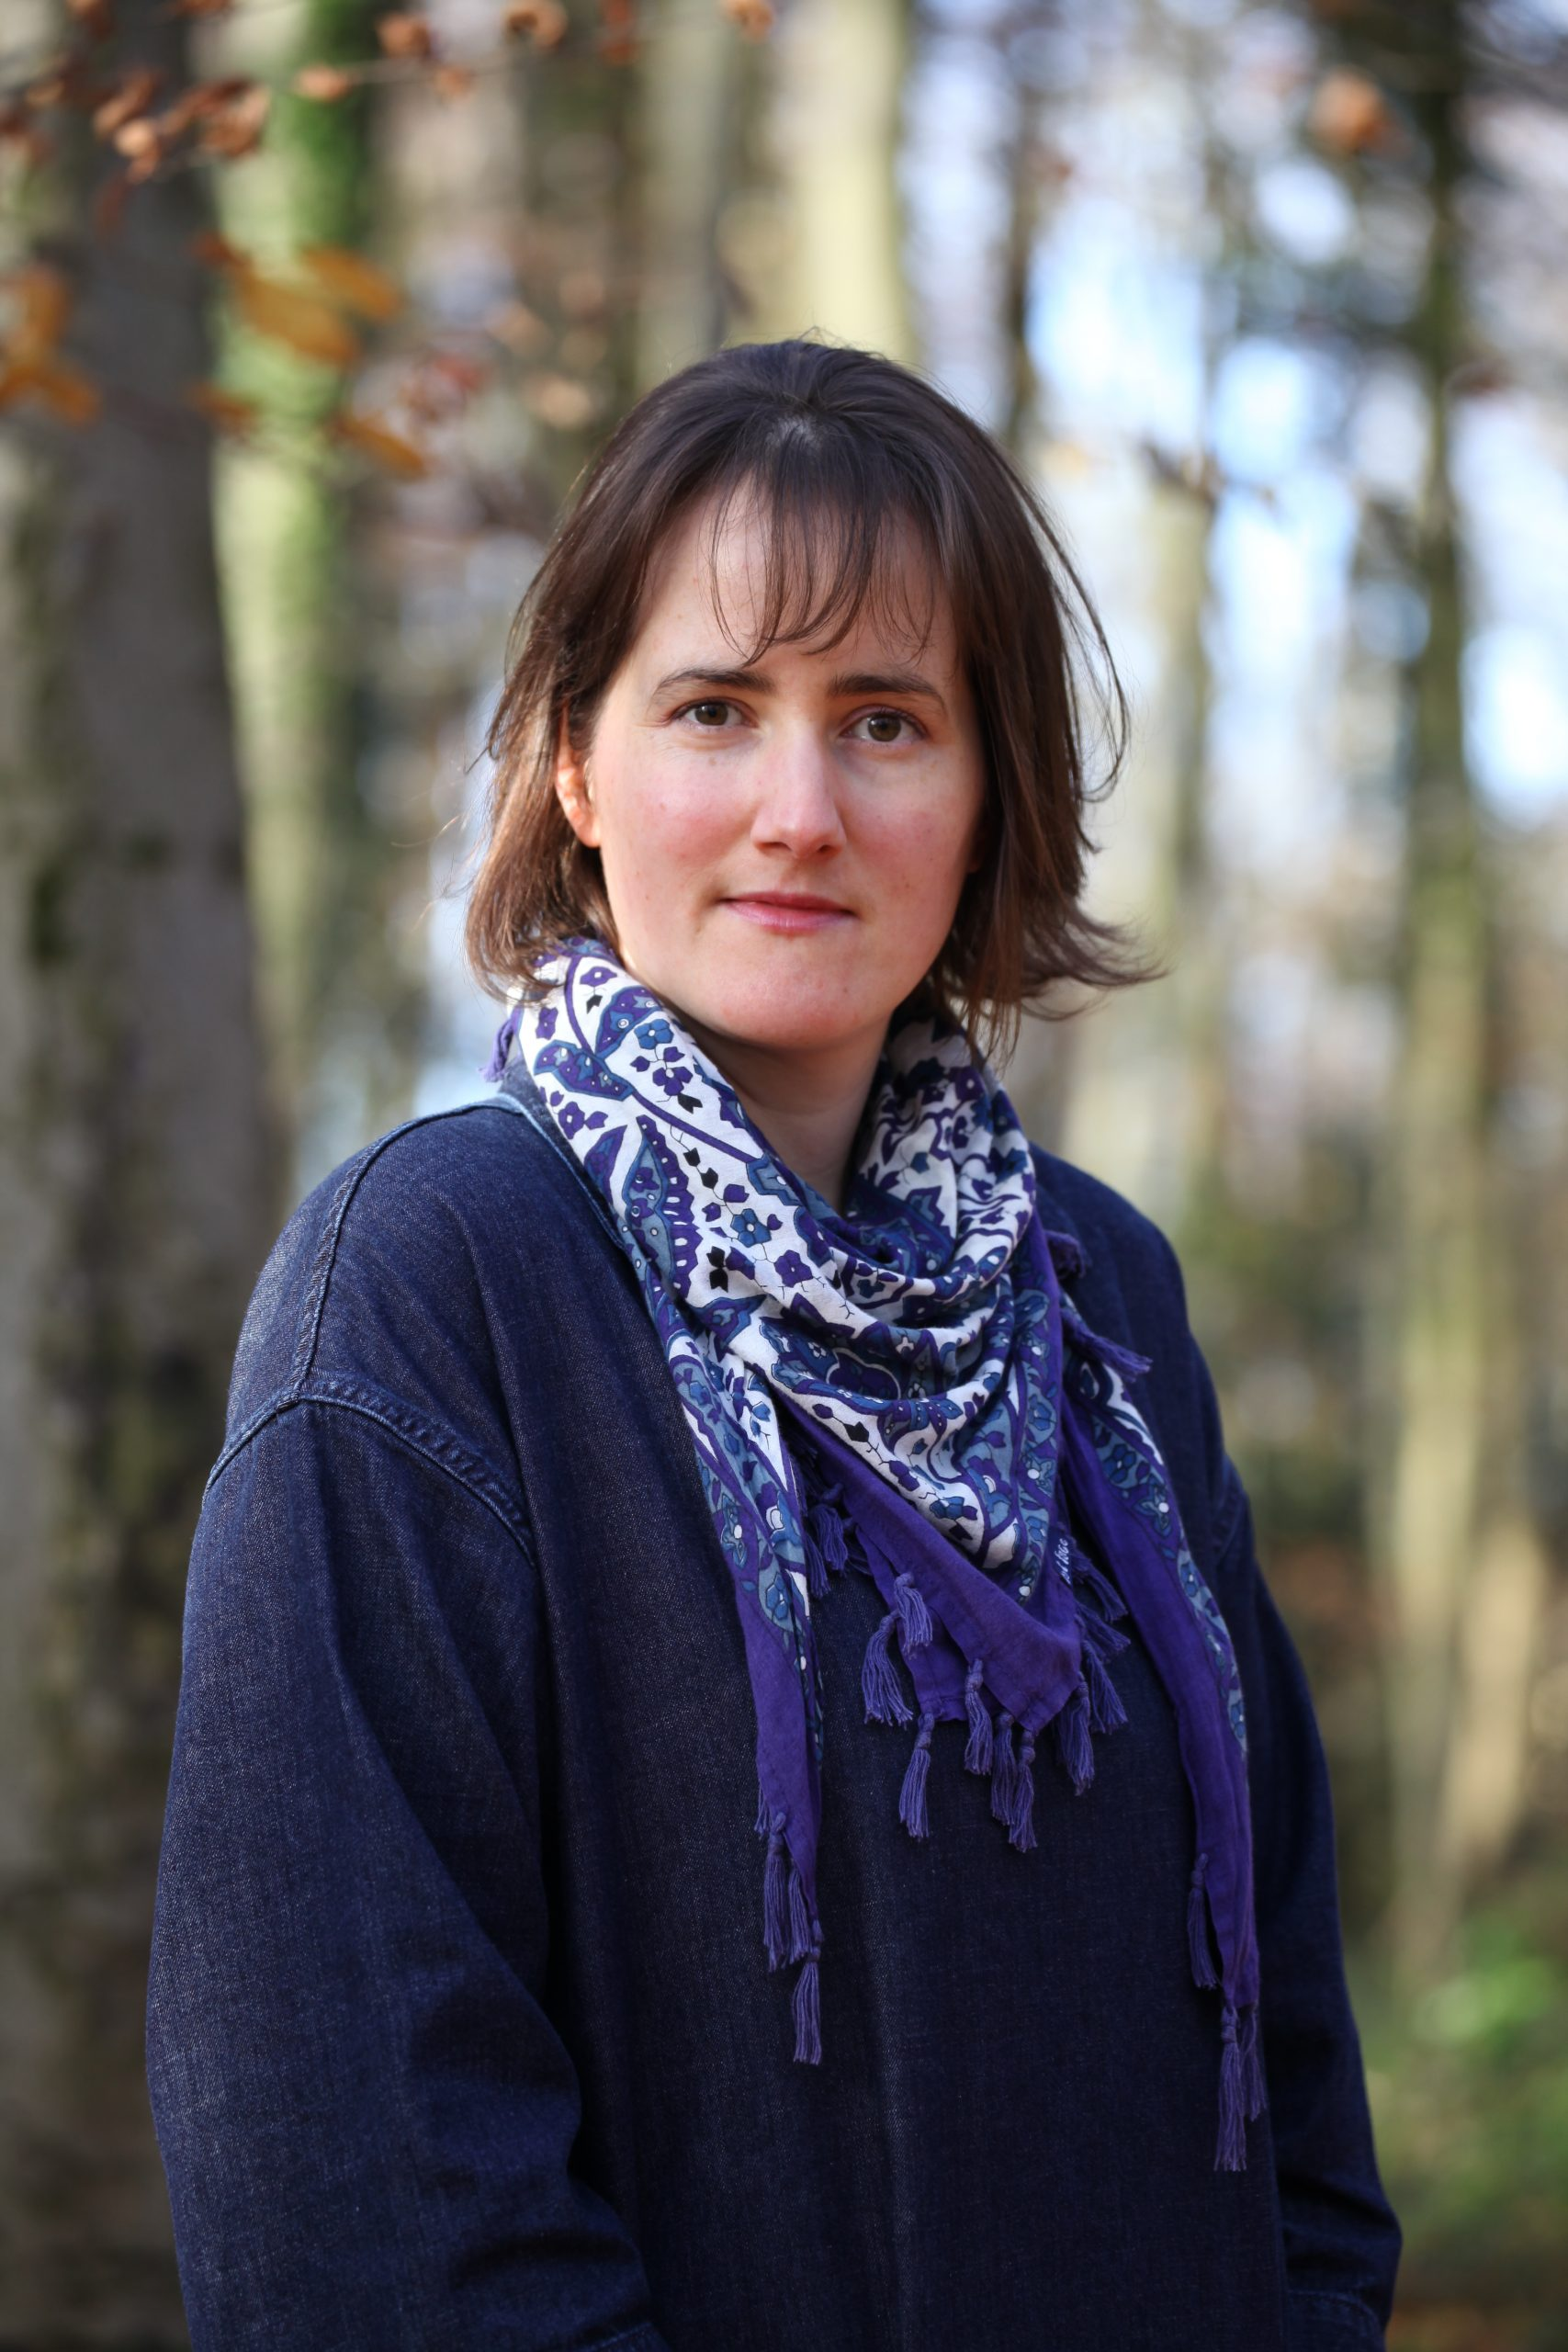 Melanie Golding